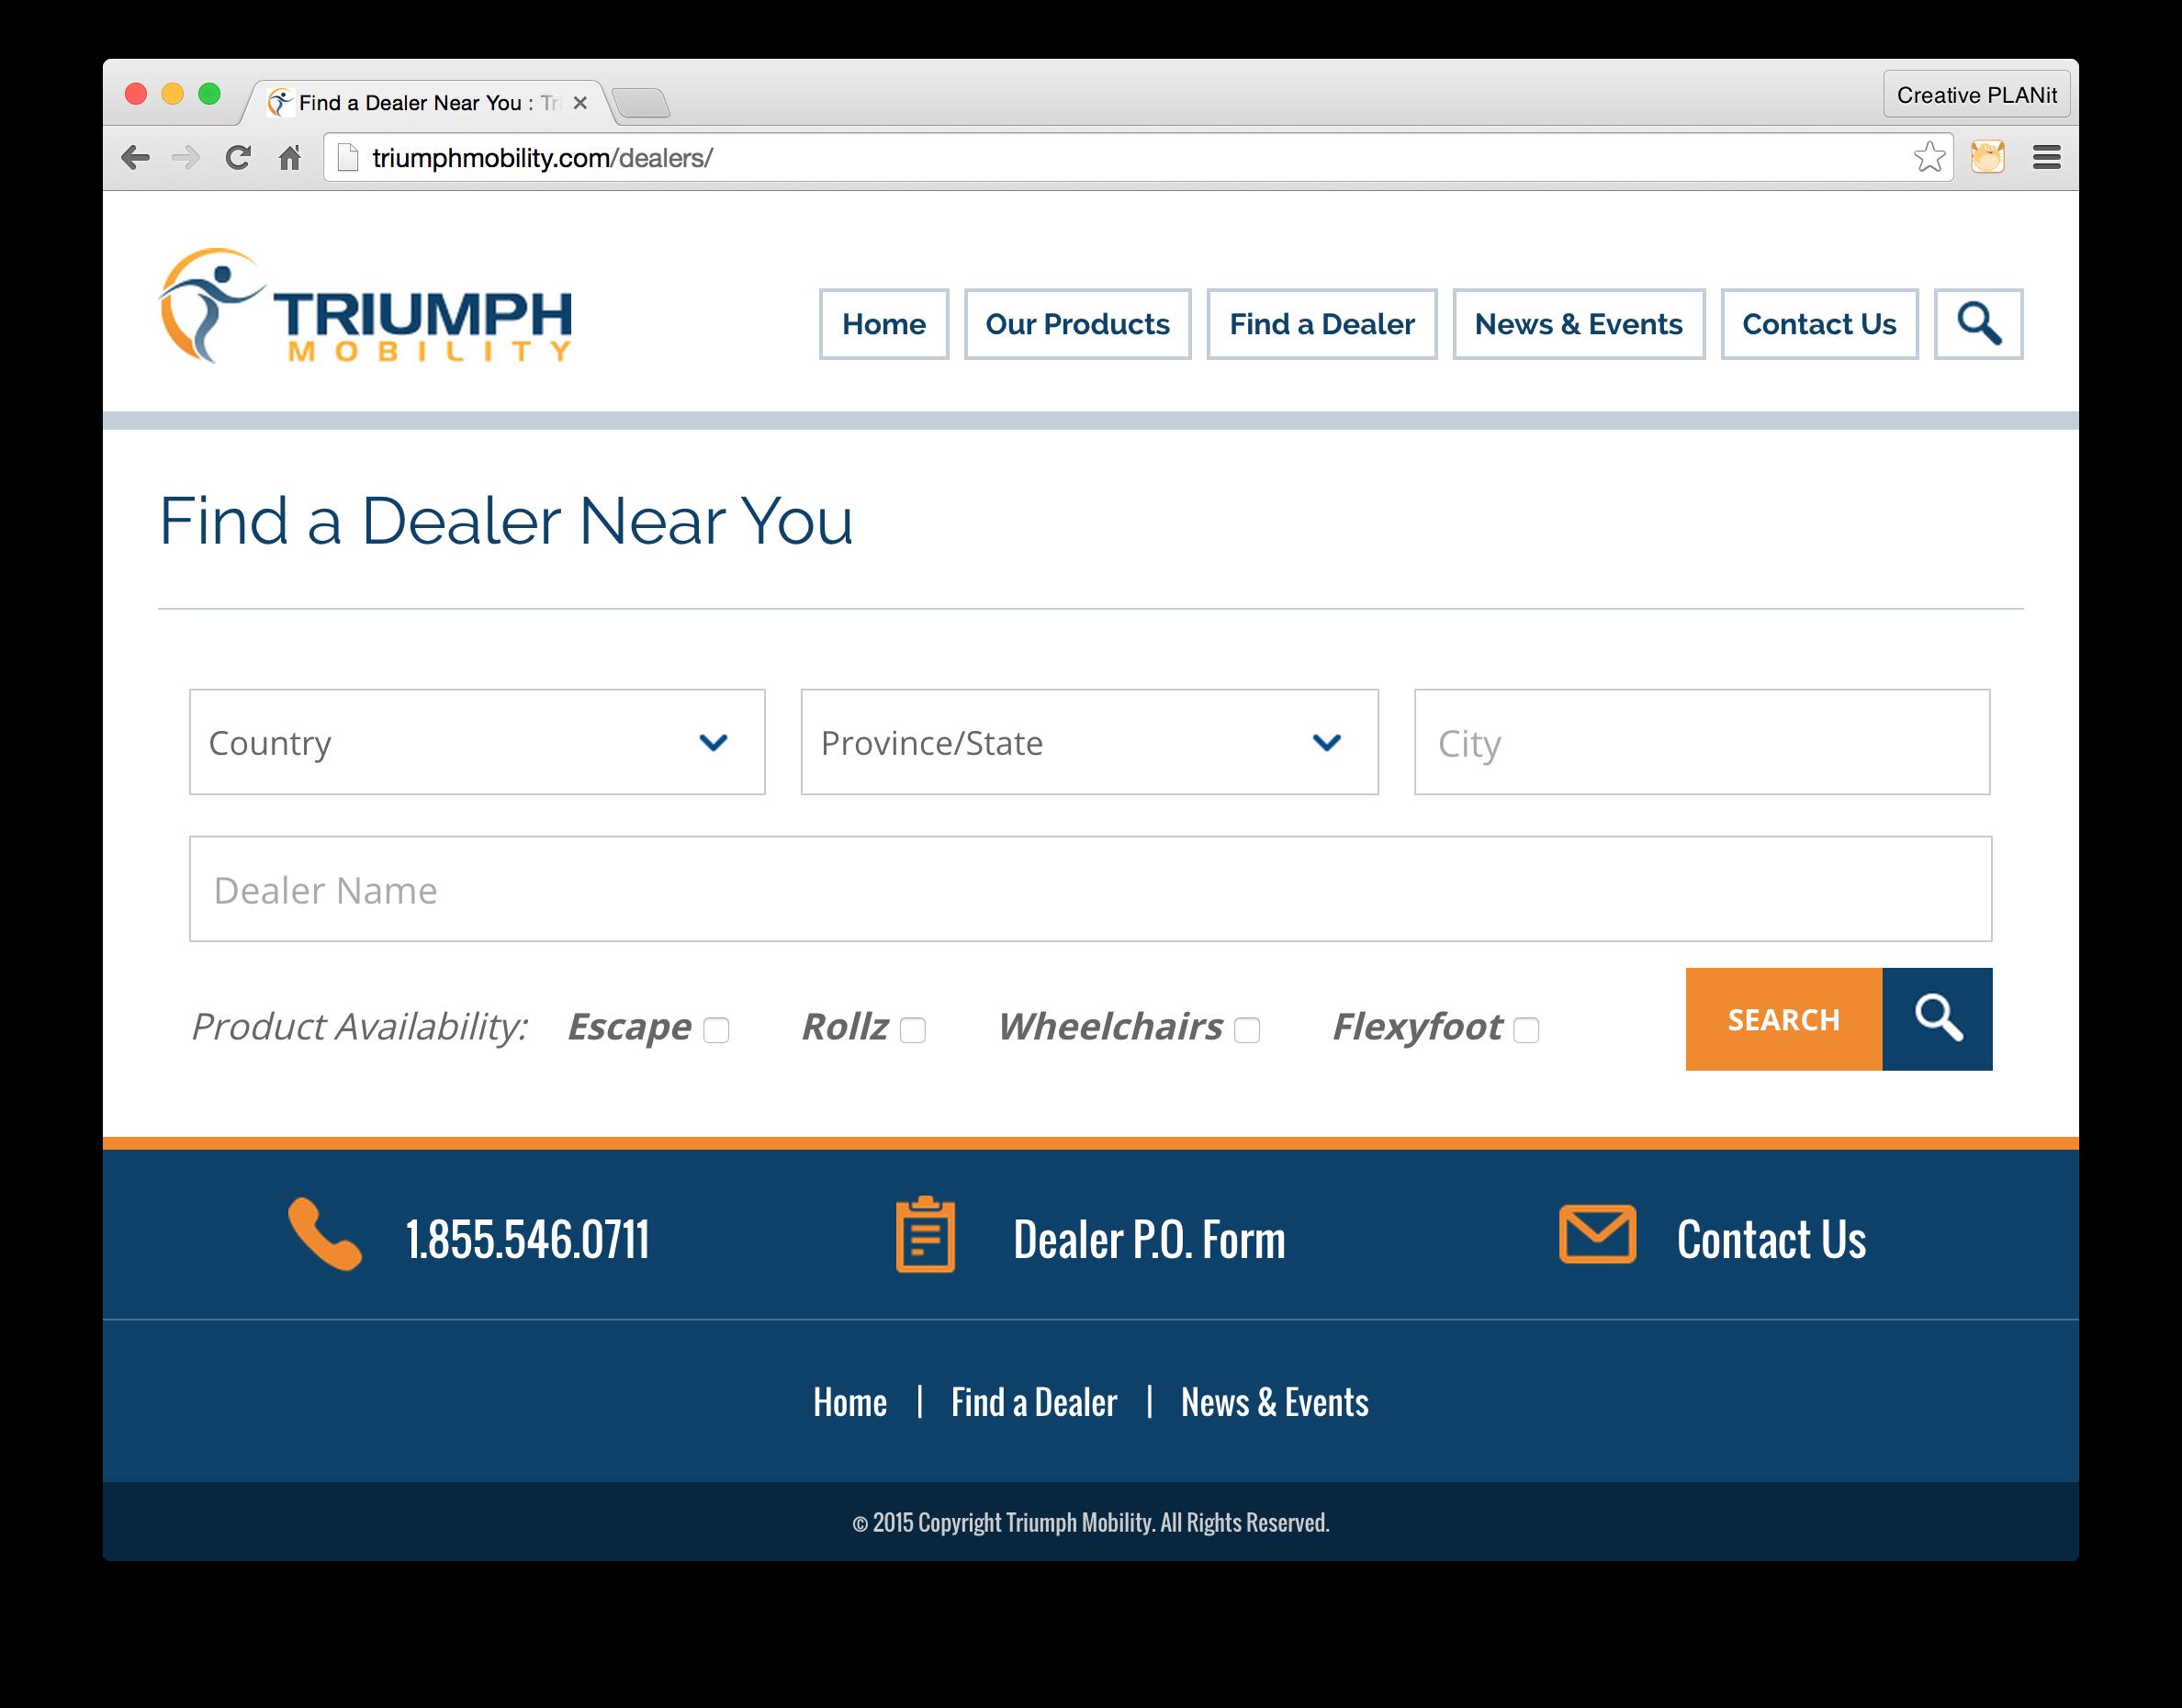 Dealer Search Form